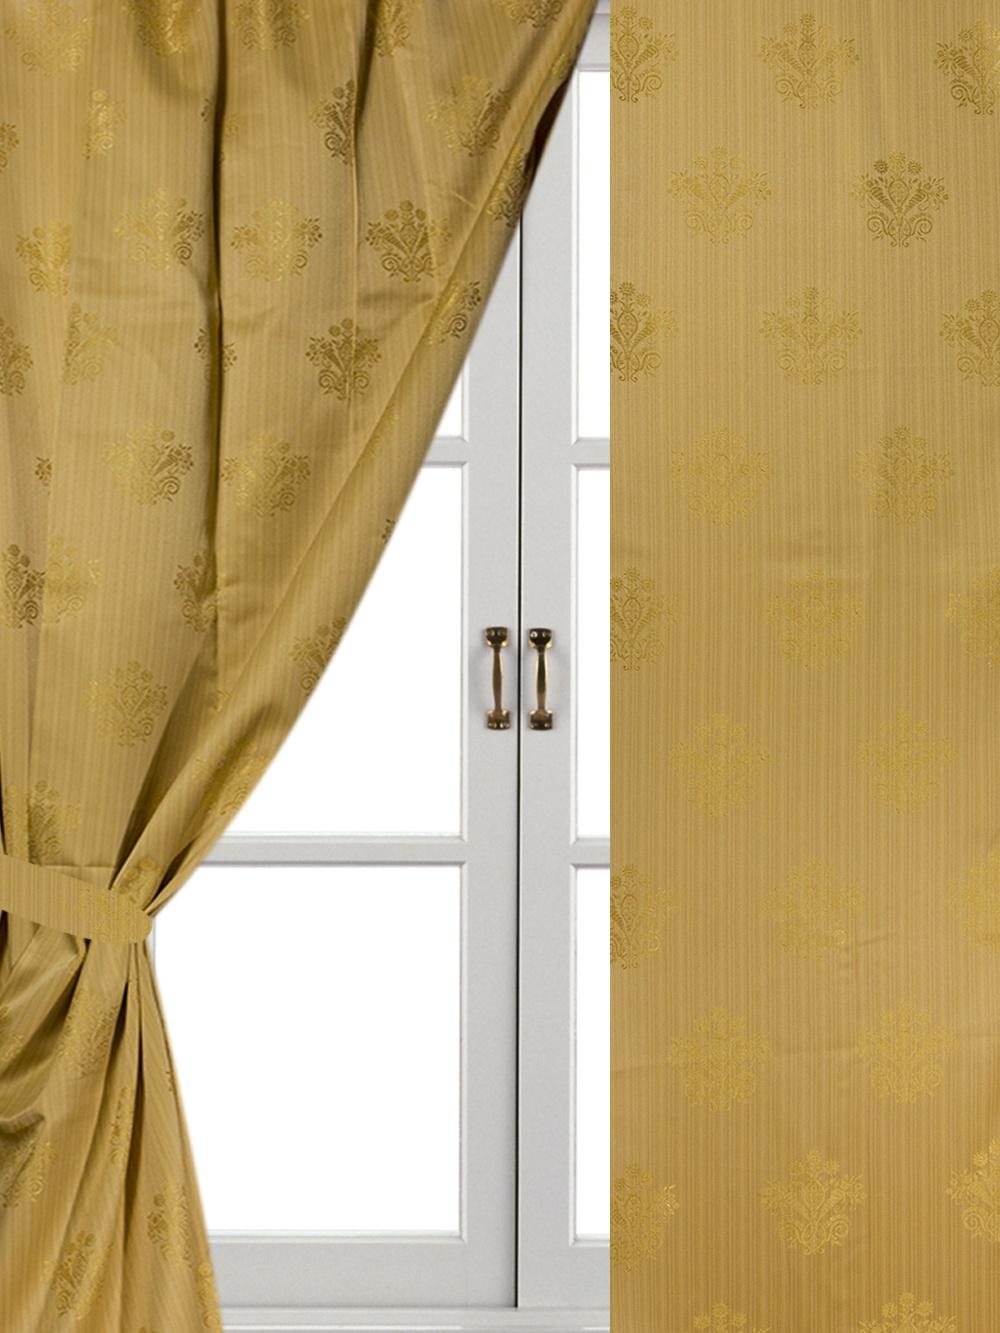 Шторы комнатные Айлант ОБ3 шторы homedeco нитяные шторы яркие кольца